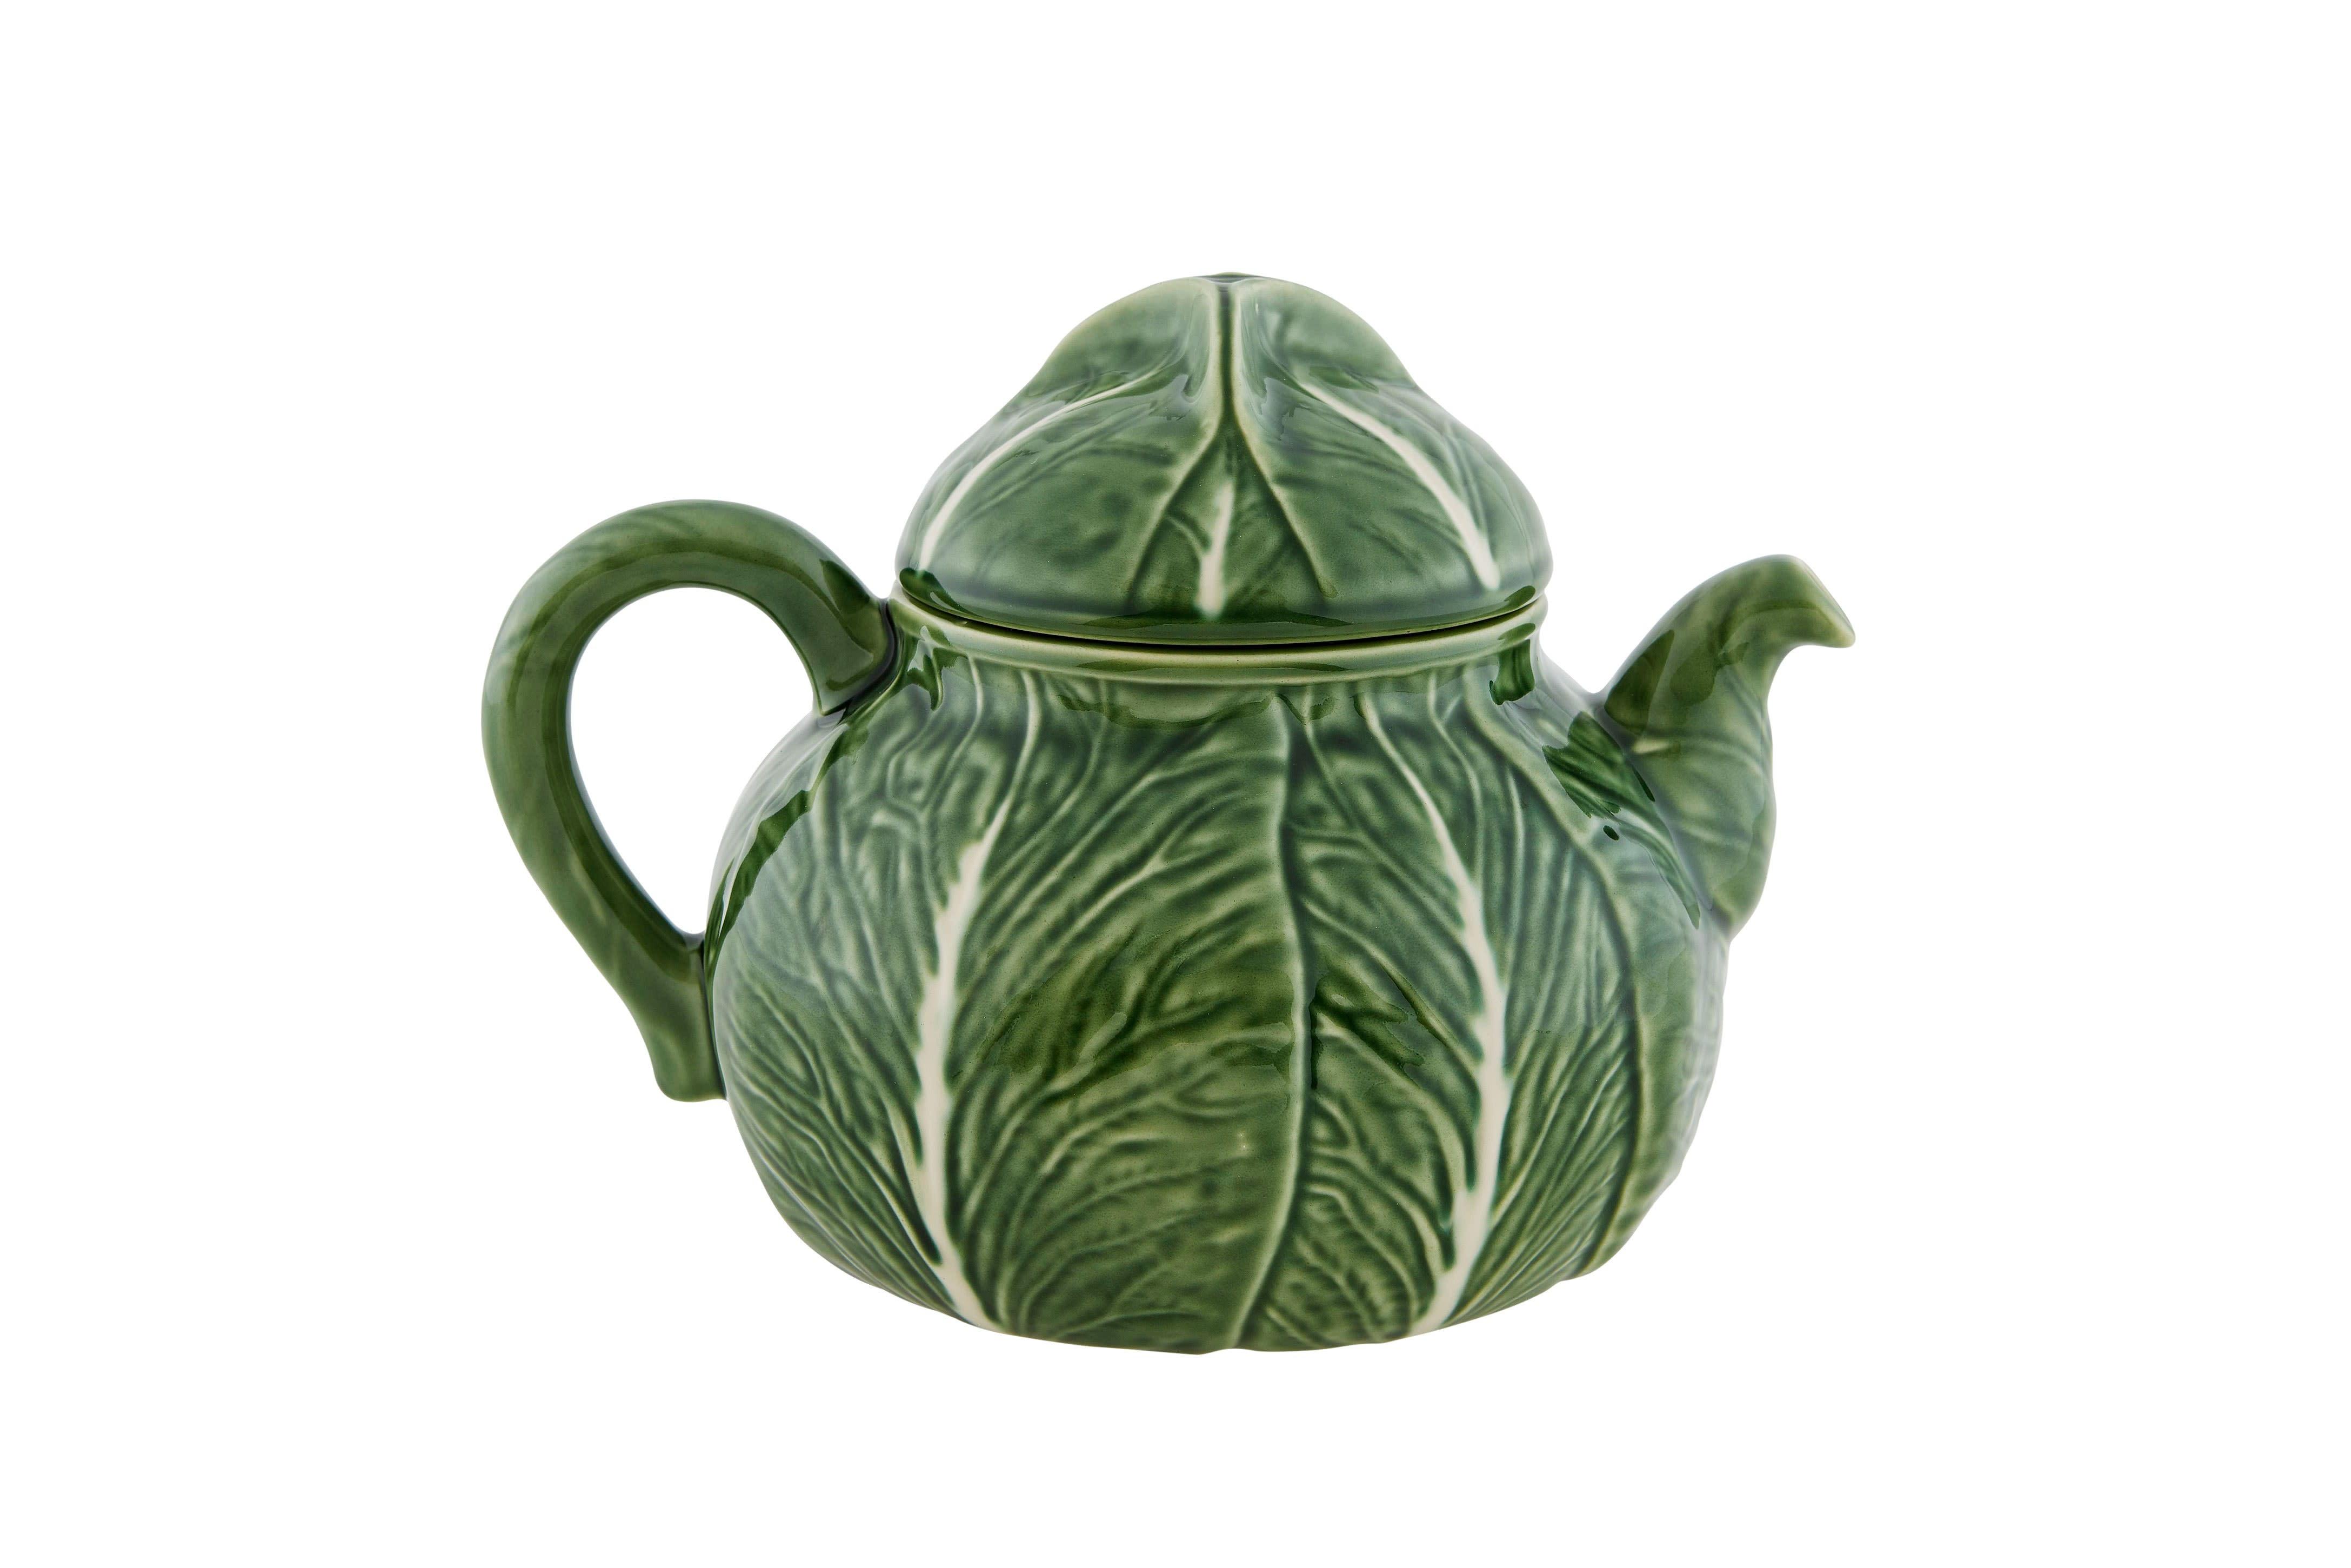 "<strong>Bordallo Pinheiro</strong> Cabbage teapot; $116. <a href=""https://us.bordallopinheiro.com"" rel=""nofollow noopener"" target=""_blank"" data-ylk=""slk:bordallopinheiro.com"" class=""link rapid-noclick-resp""><em>bordallopinheiro.com</em></a>"